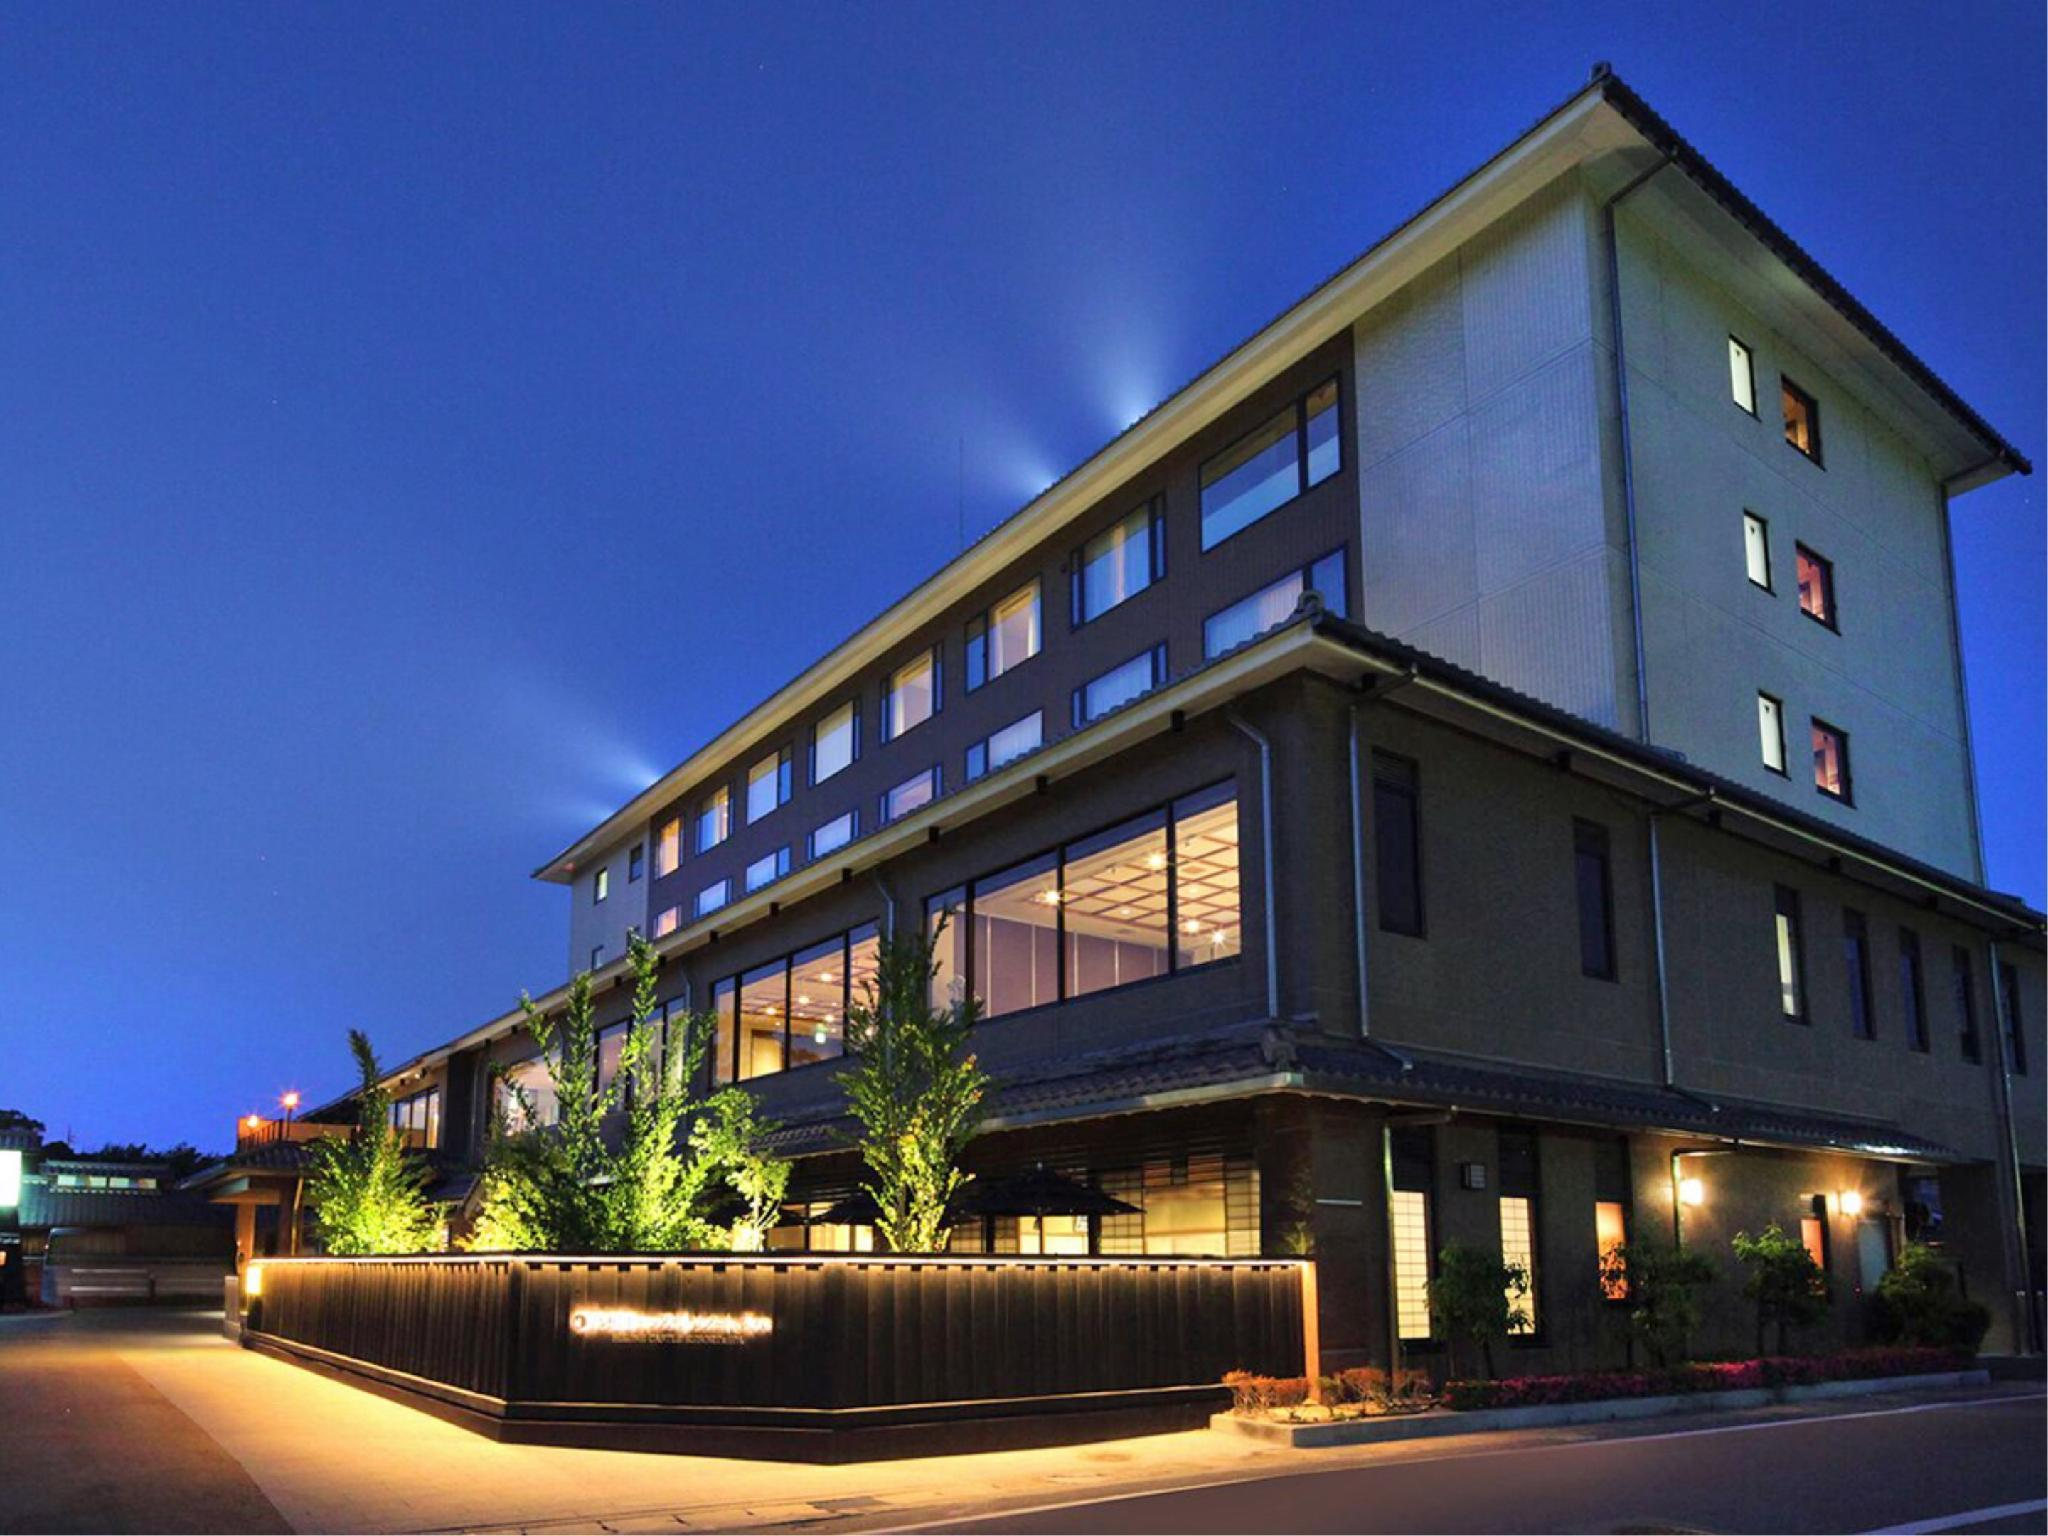 Hikone Castle Resort And Spa